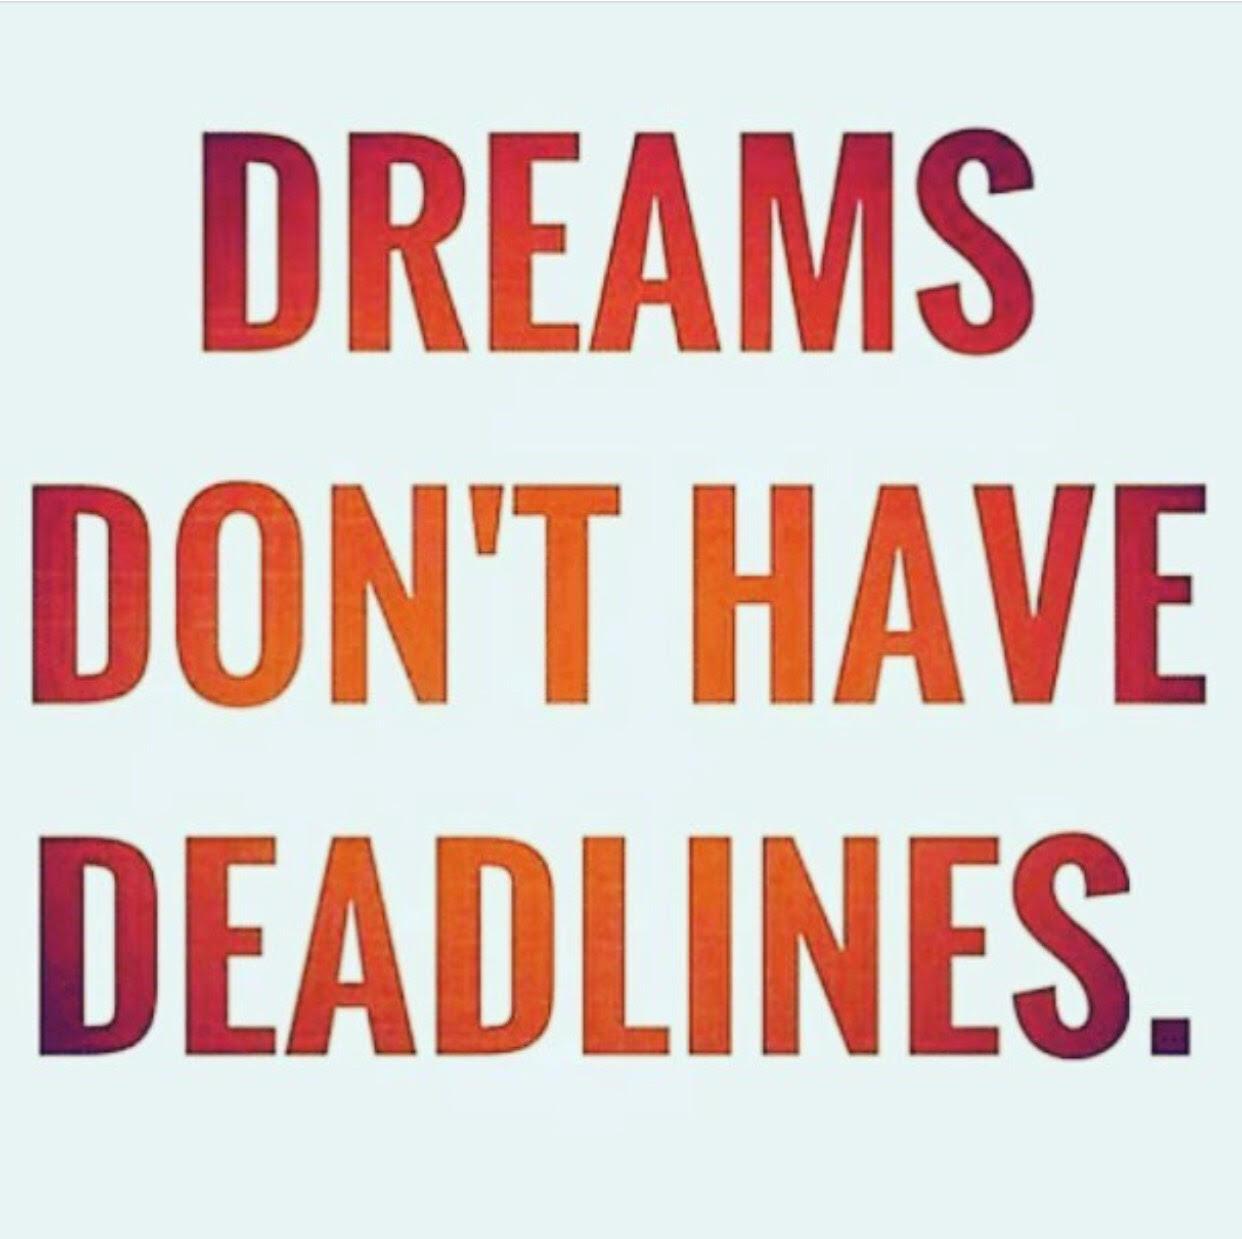 Mimpi Yang Tiada Kesudahan,motivasi diri, harapan, aim high